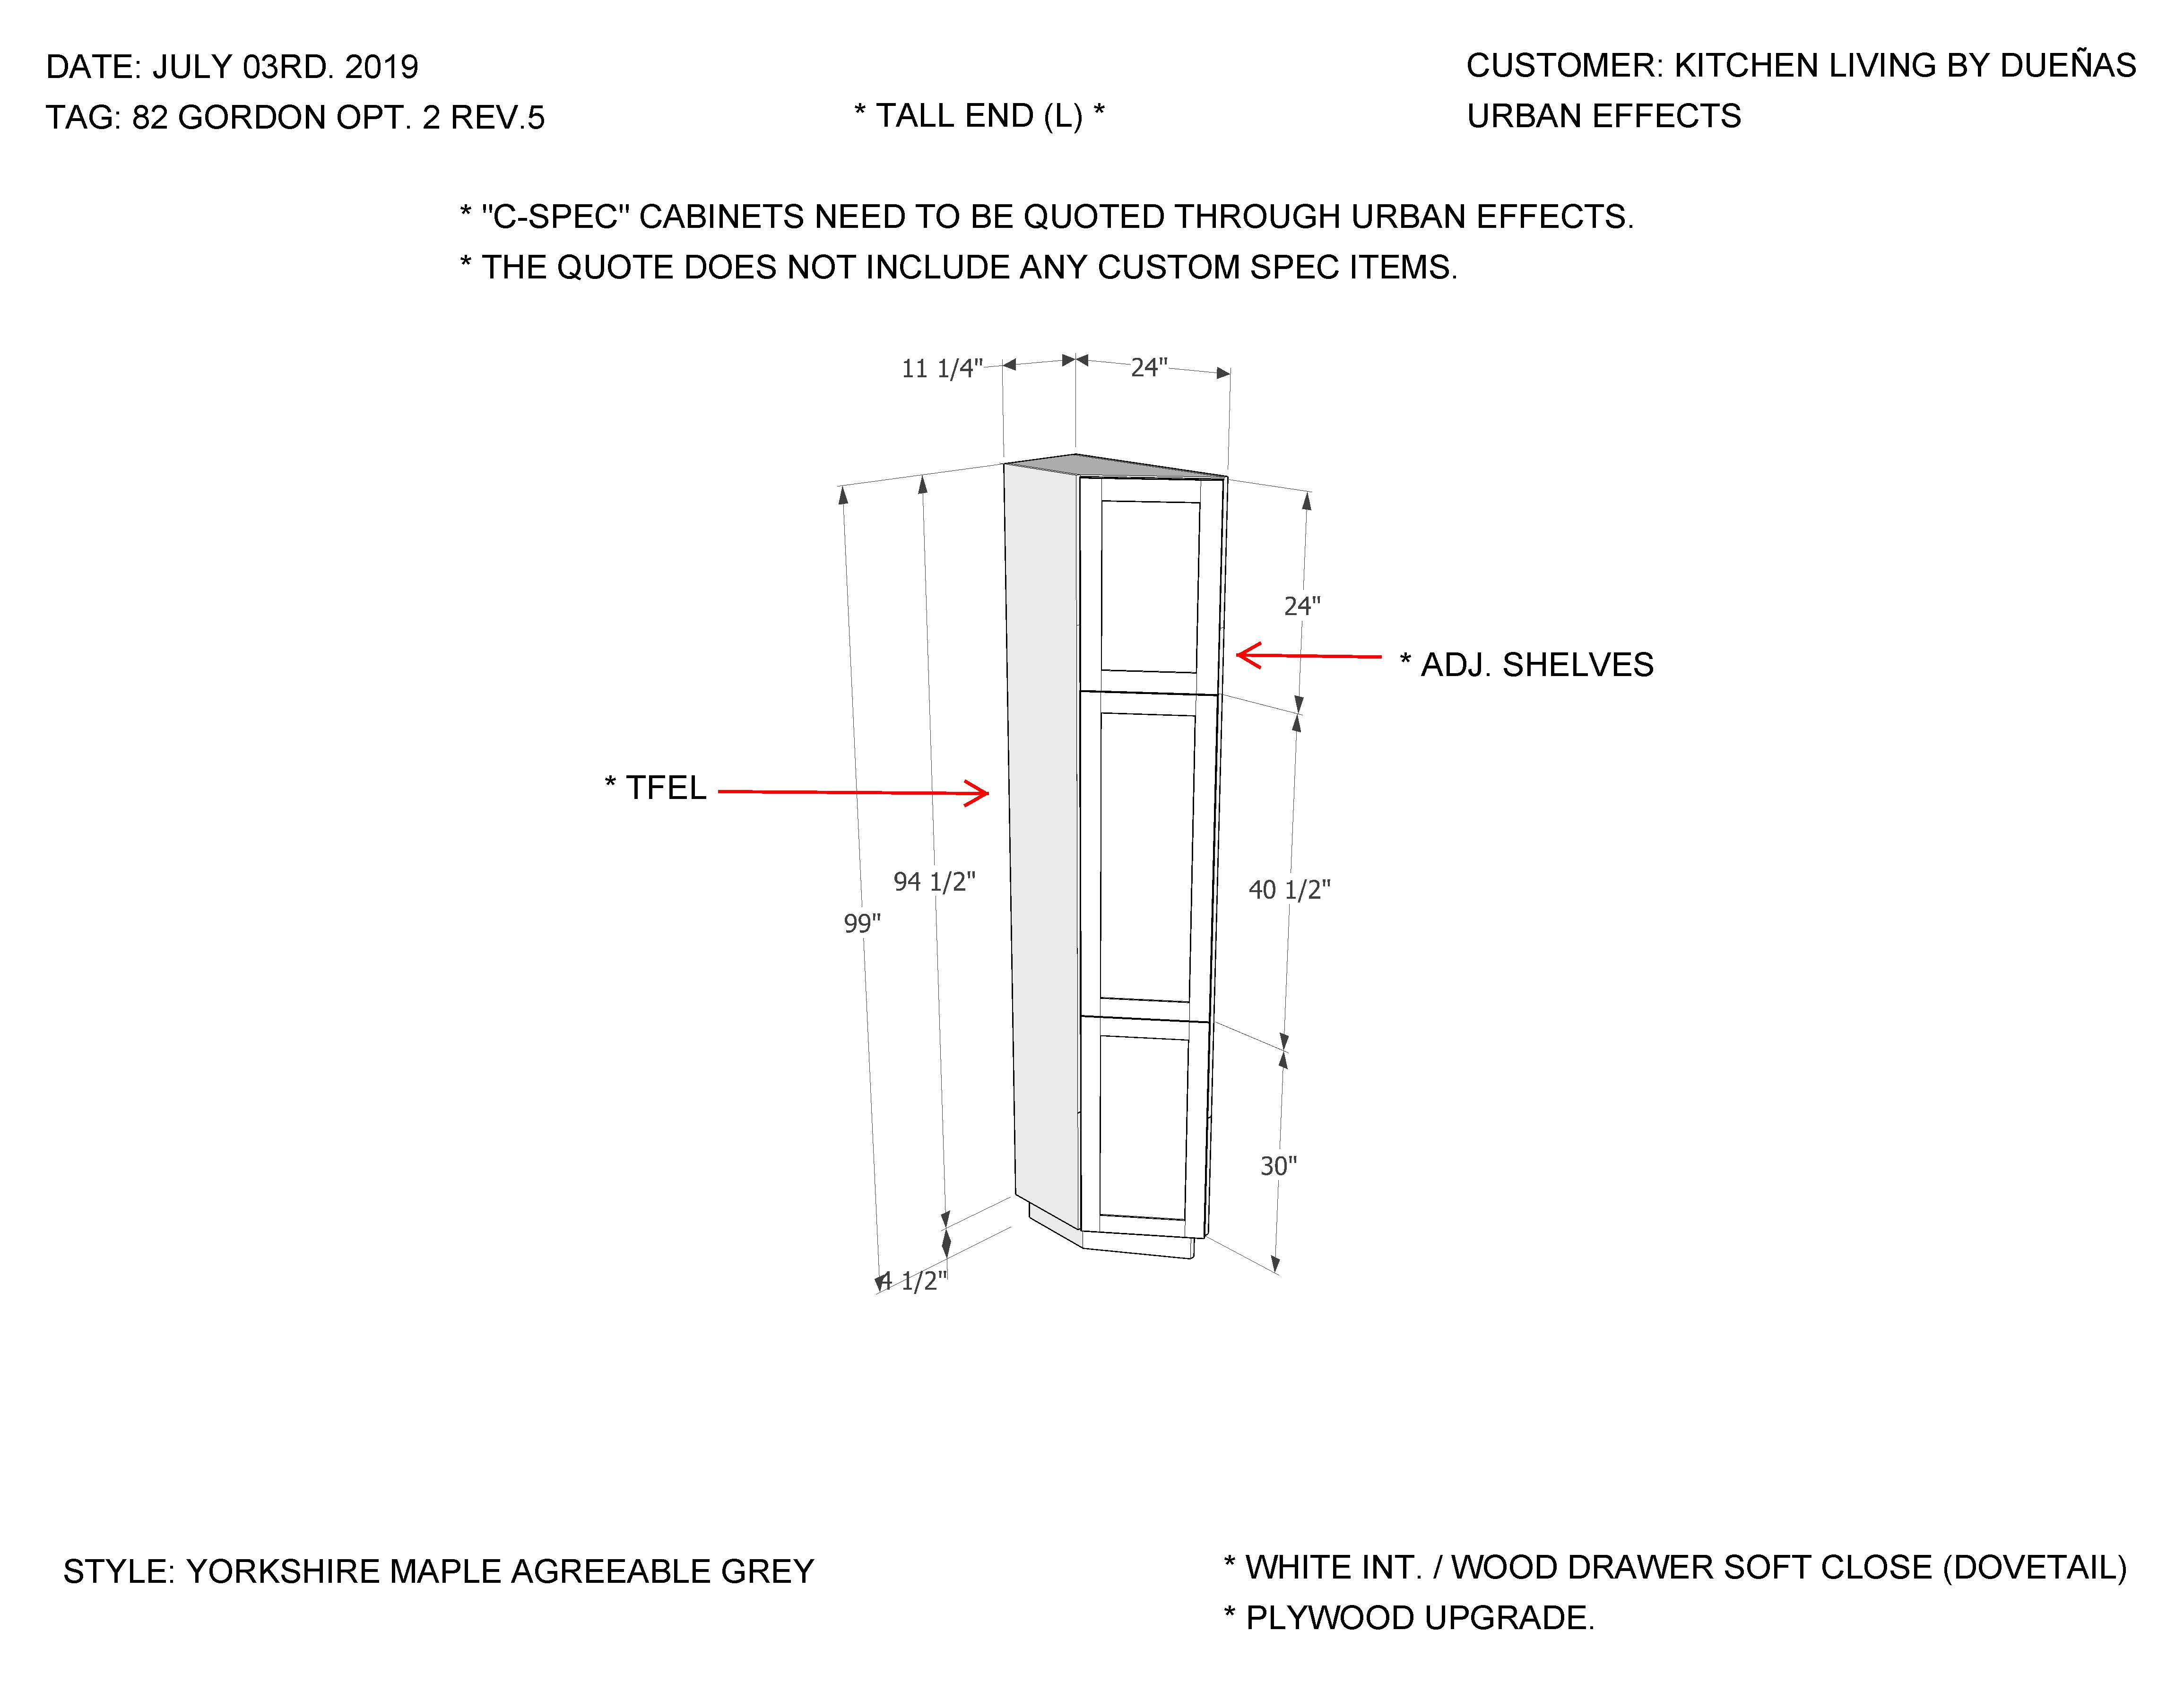 82 GORDON OPT. 2 REV.5-11_Page_22